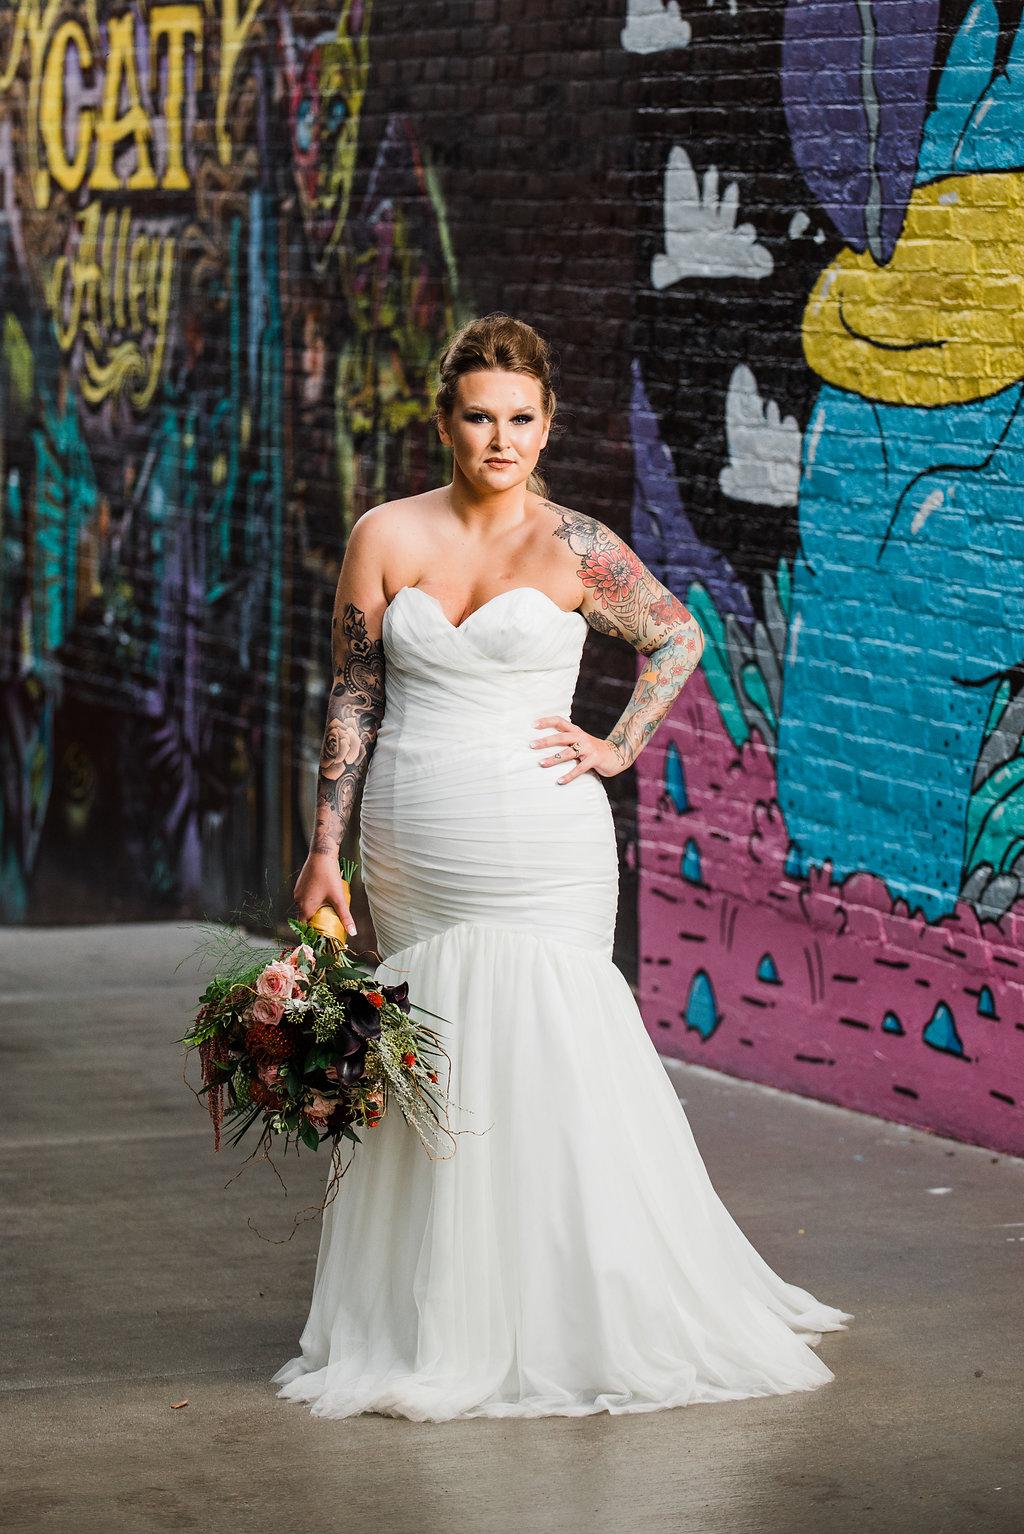 Milwaukee-Wisconsin-Wedding-Photographer-Black-Cat-Alley-Styled-Bridal-Shoot-47.jpg